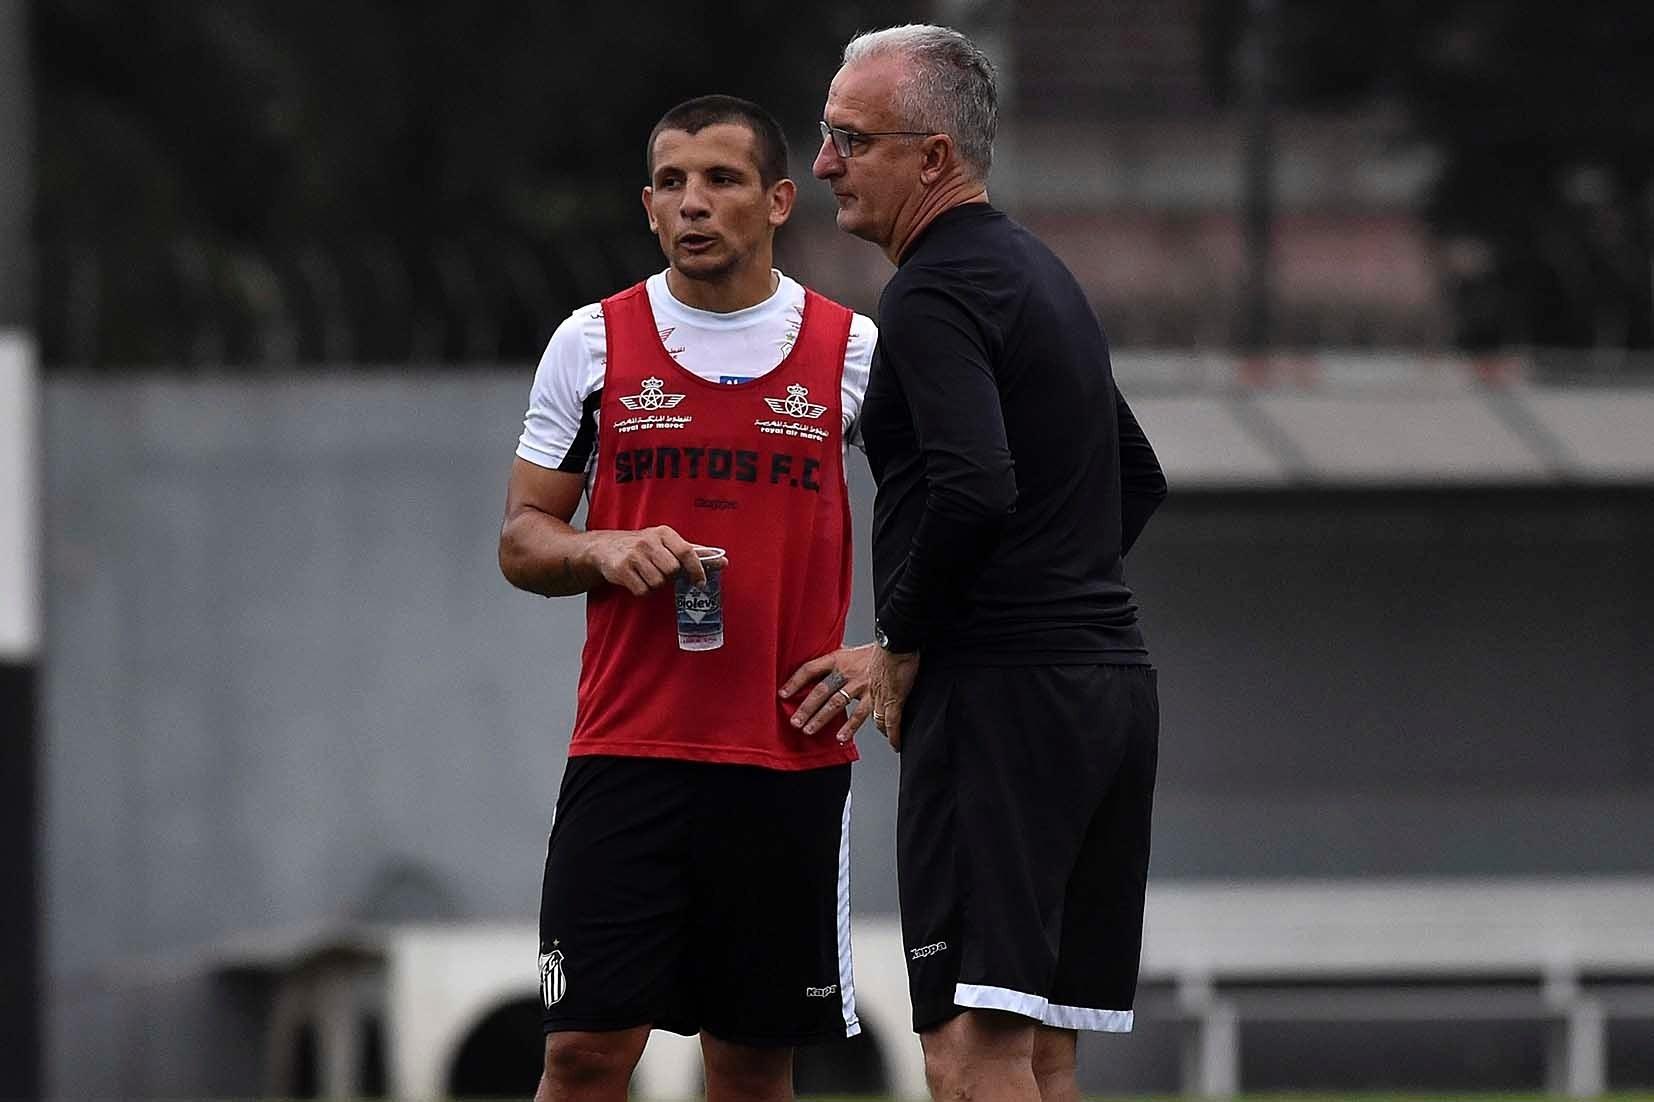 a77549b2107ee Entenda por que argentino está afastado no Santos e virou rival de Dorival  - 08 03 2017 - UOL Esporte